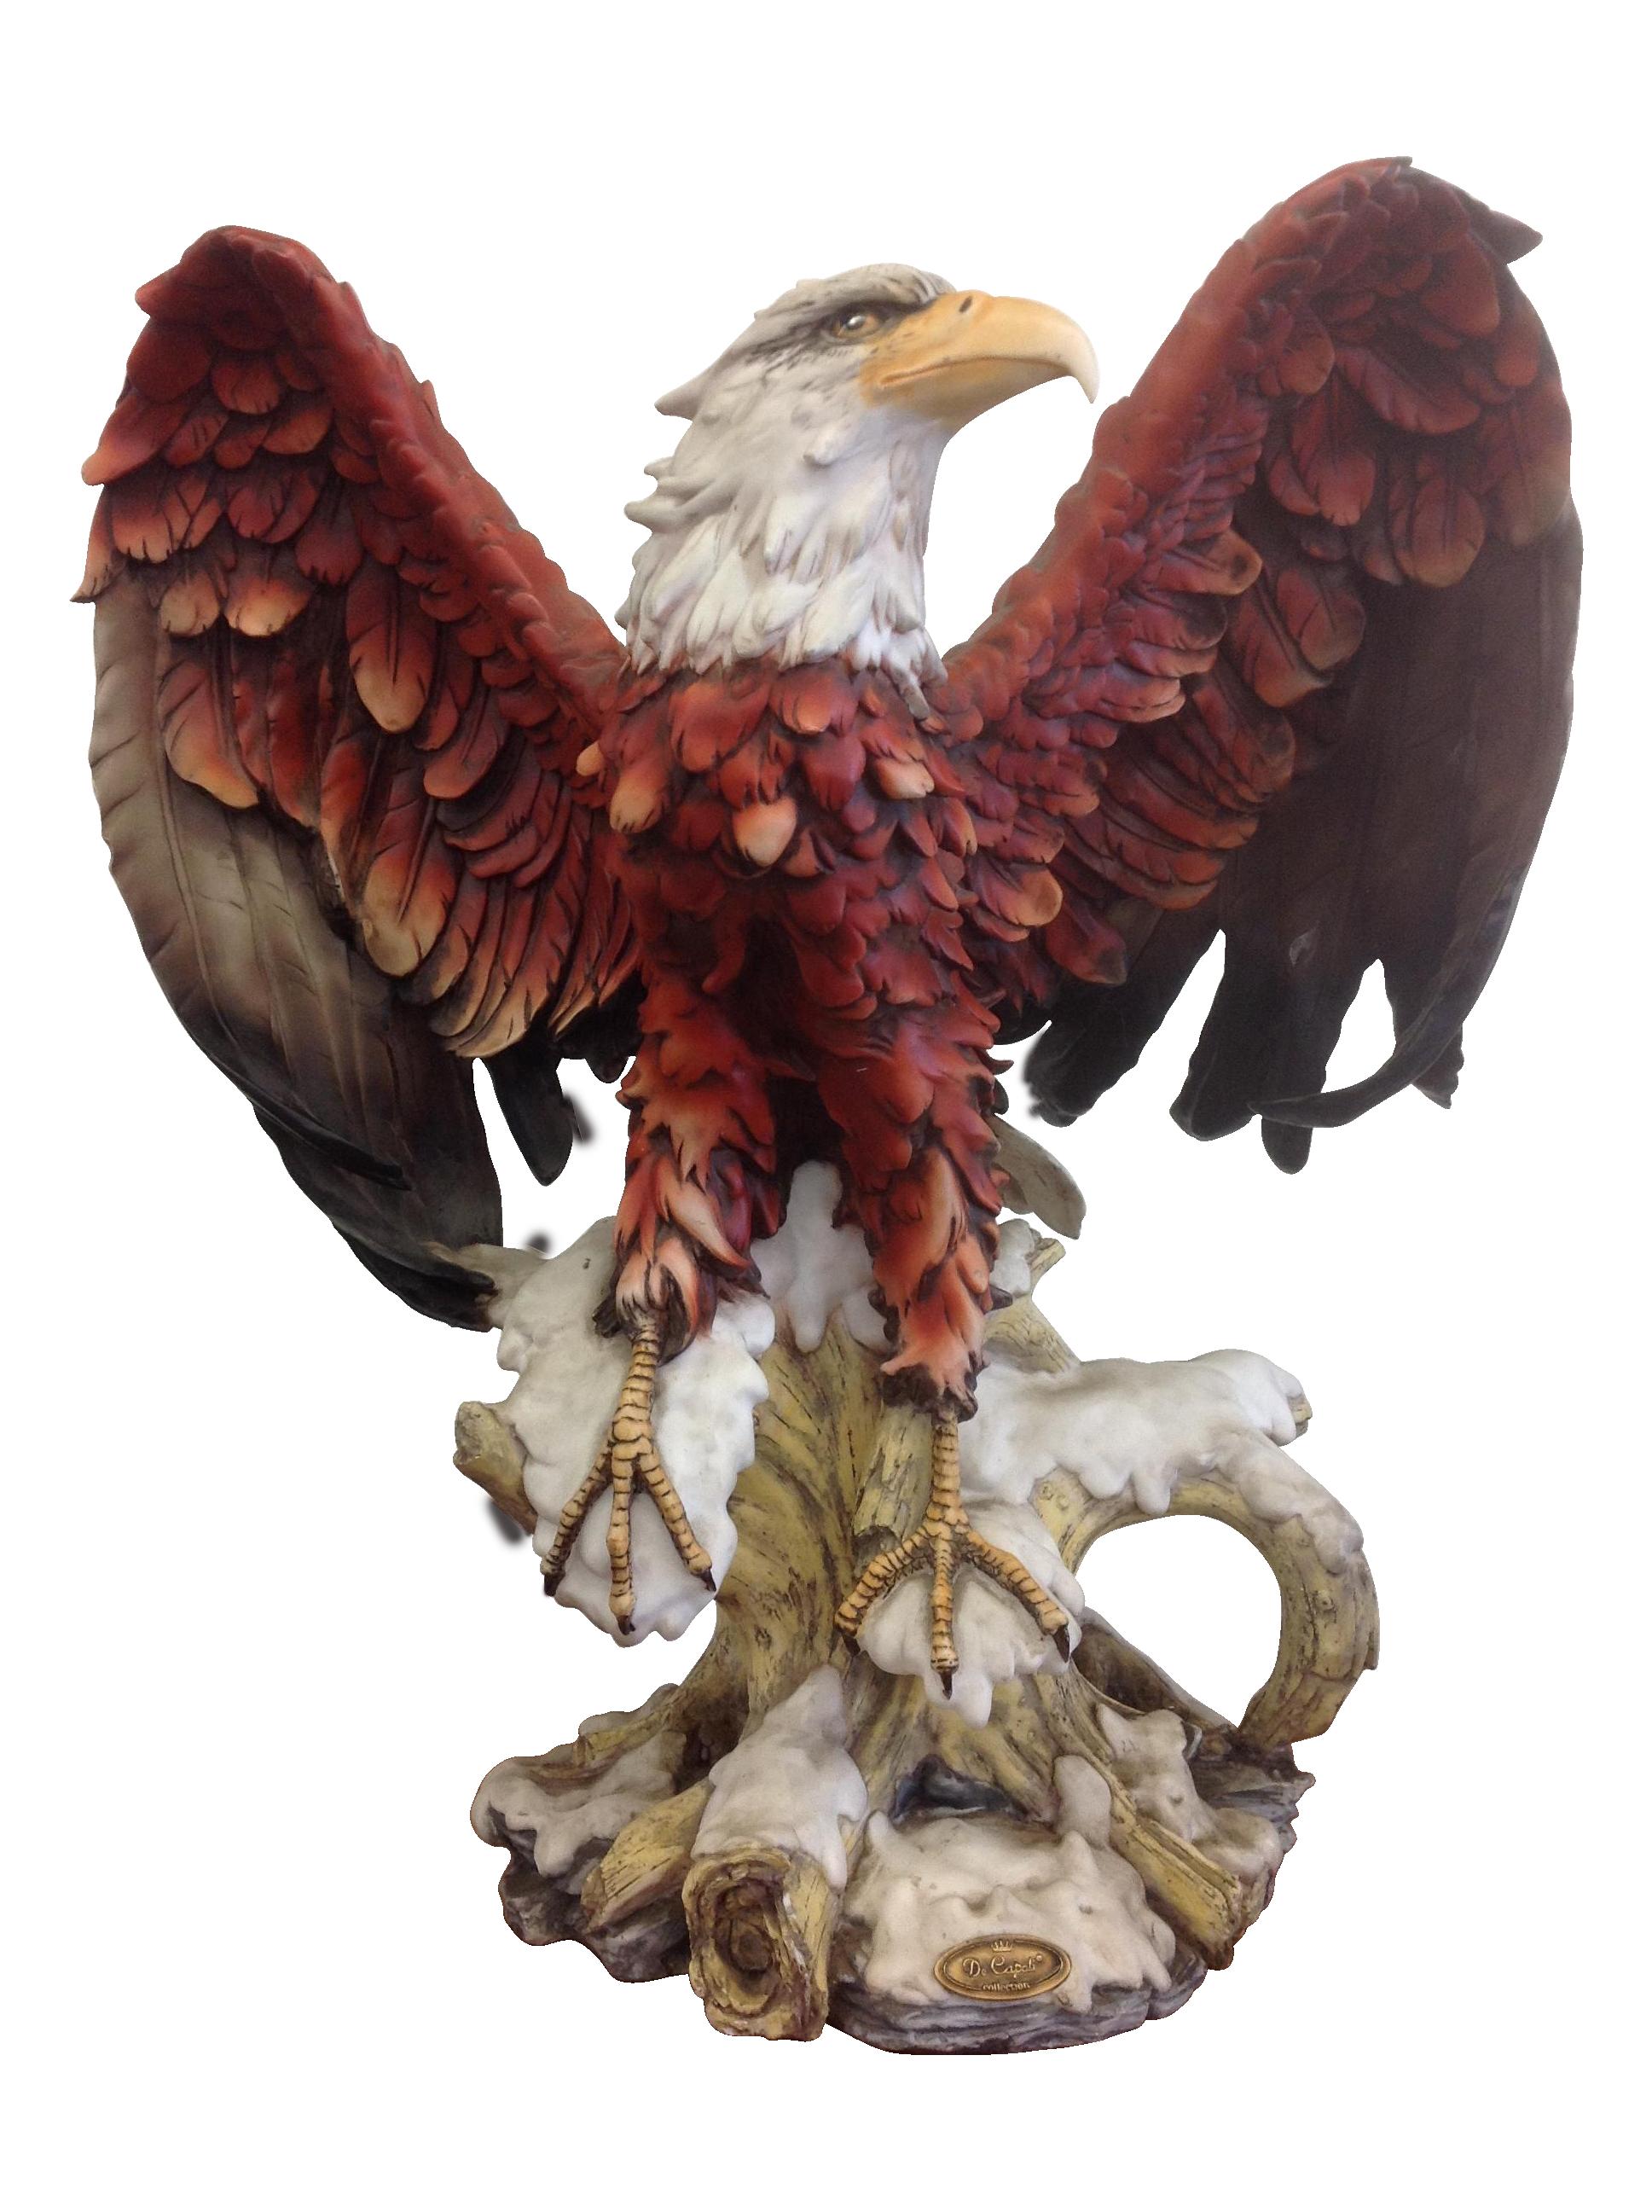 Decapoli Collection Bald Eagle Sculpture Chairish